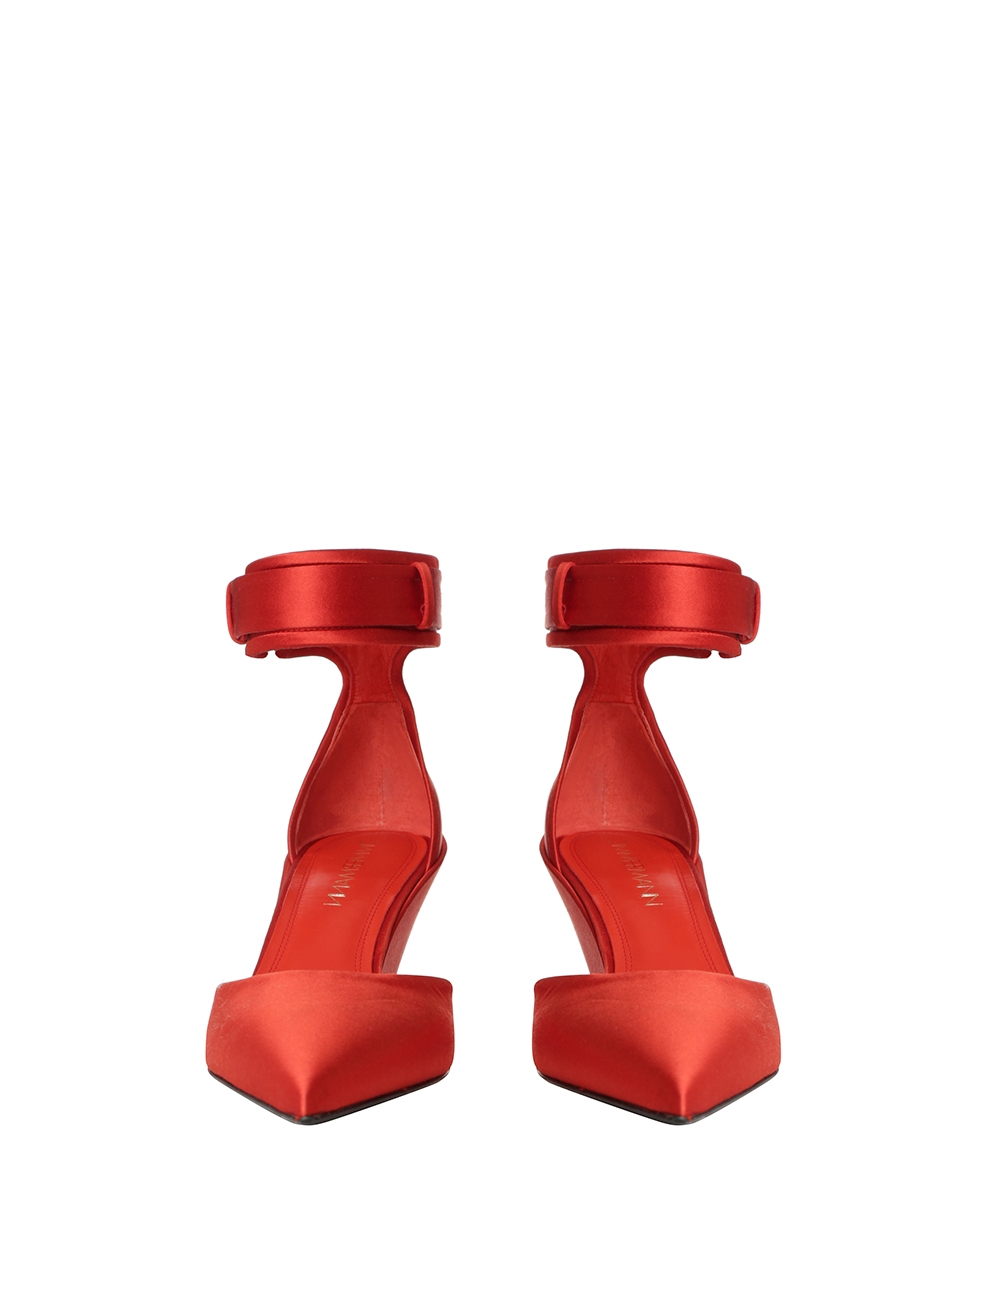 Product Styling Image